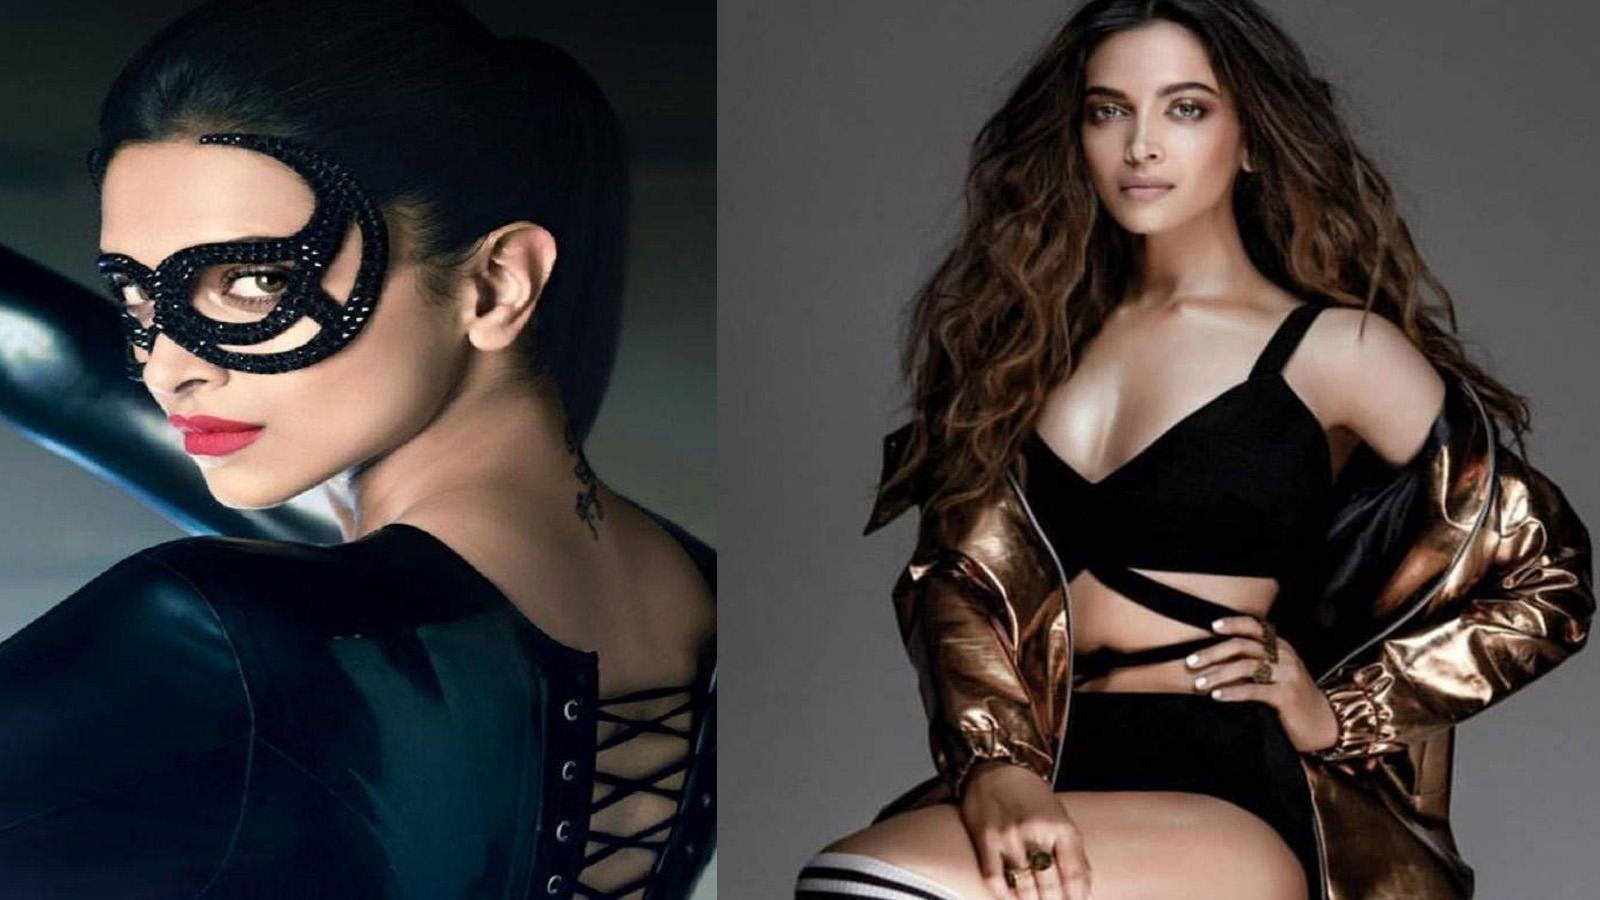 Deepika Padukone to now be part of a superhero film